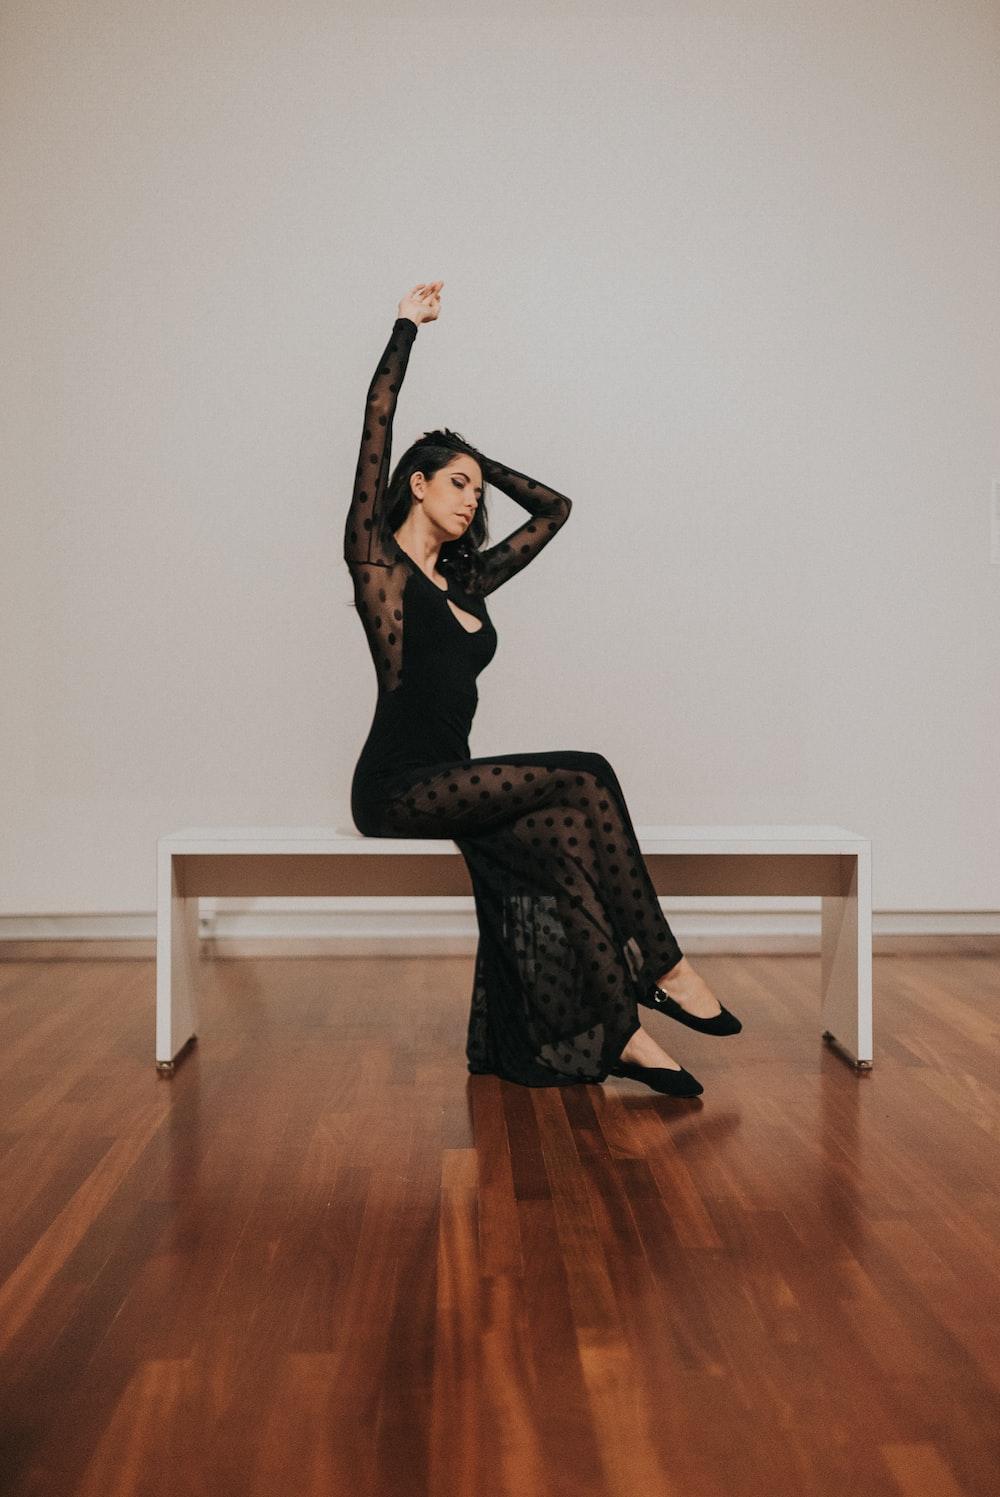 woman in black long-sleeved dress